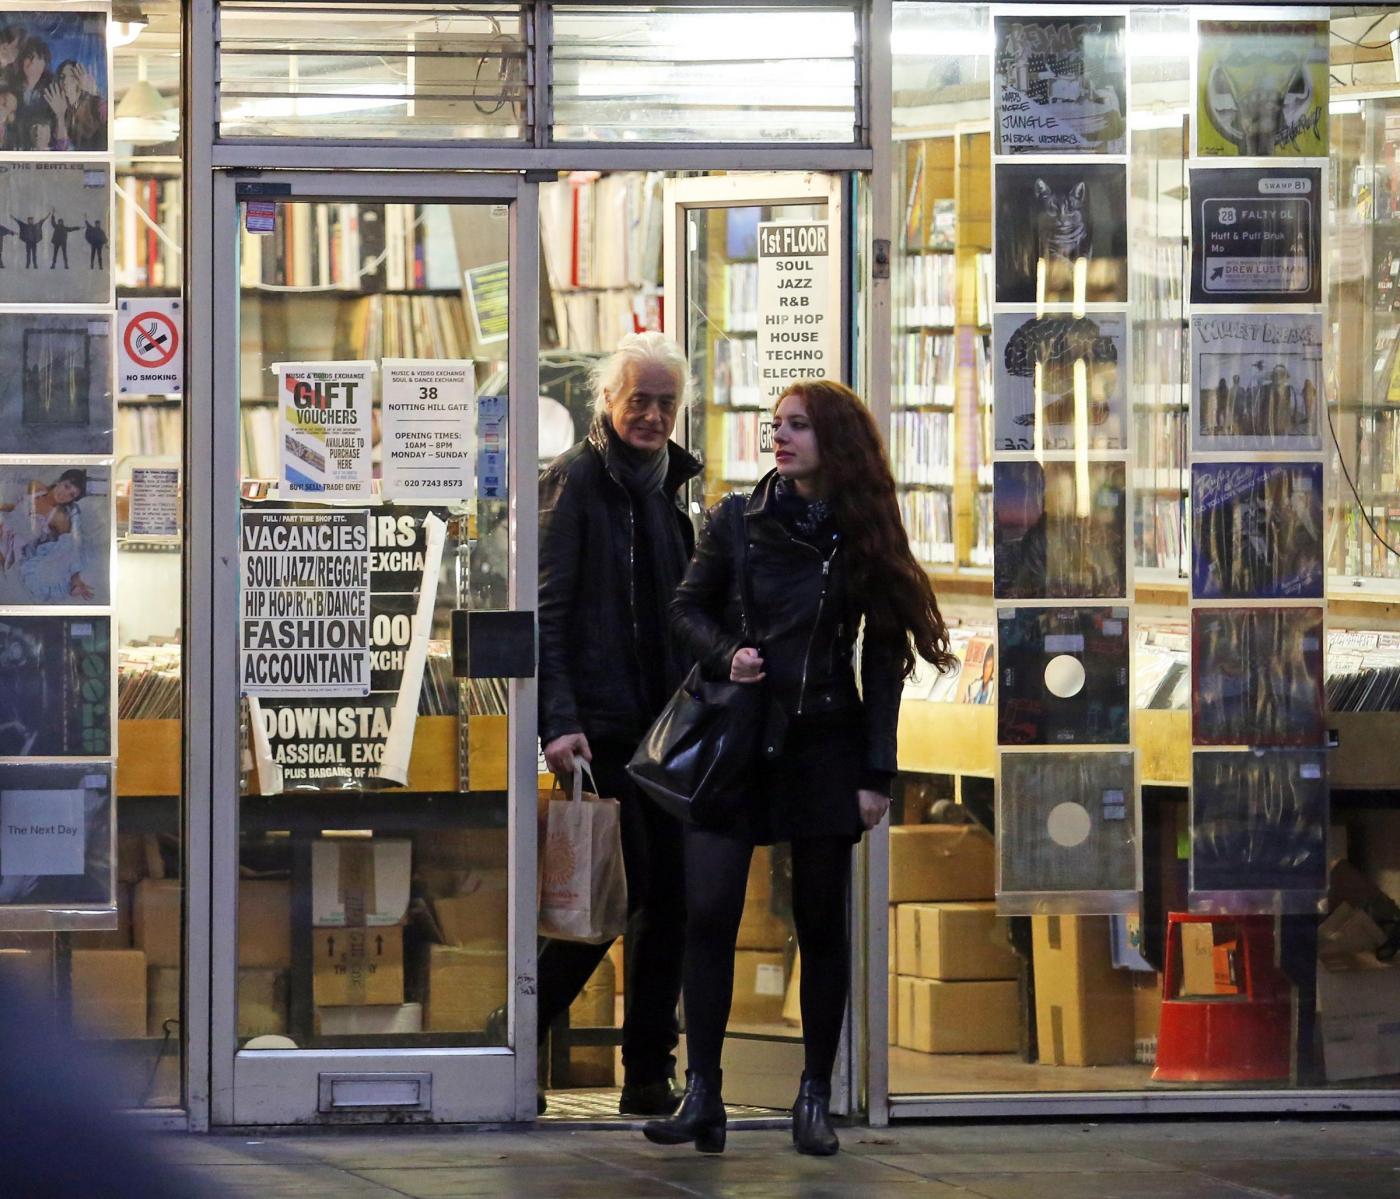 Jimmy Page e la fidanzata 25enne Scarlett Sabet: compleanno al fast food09